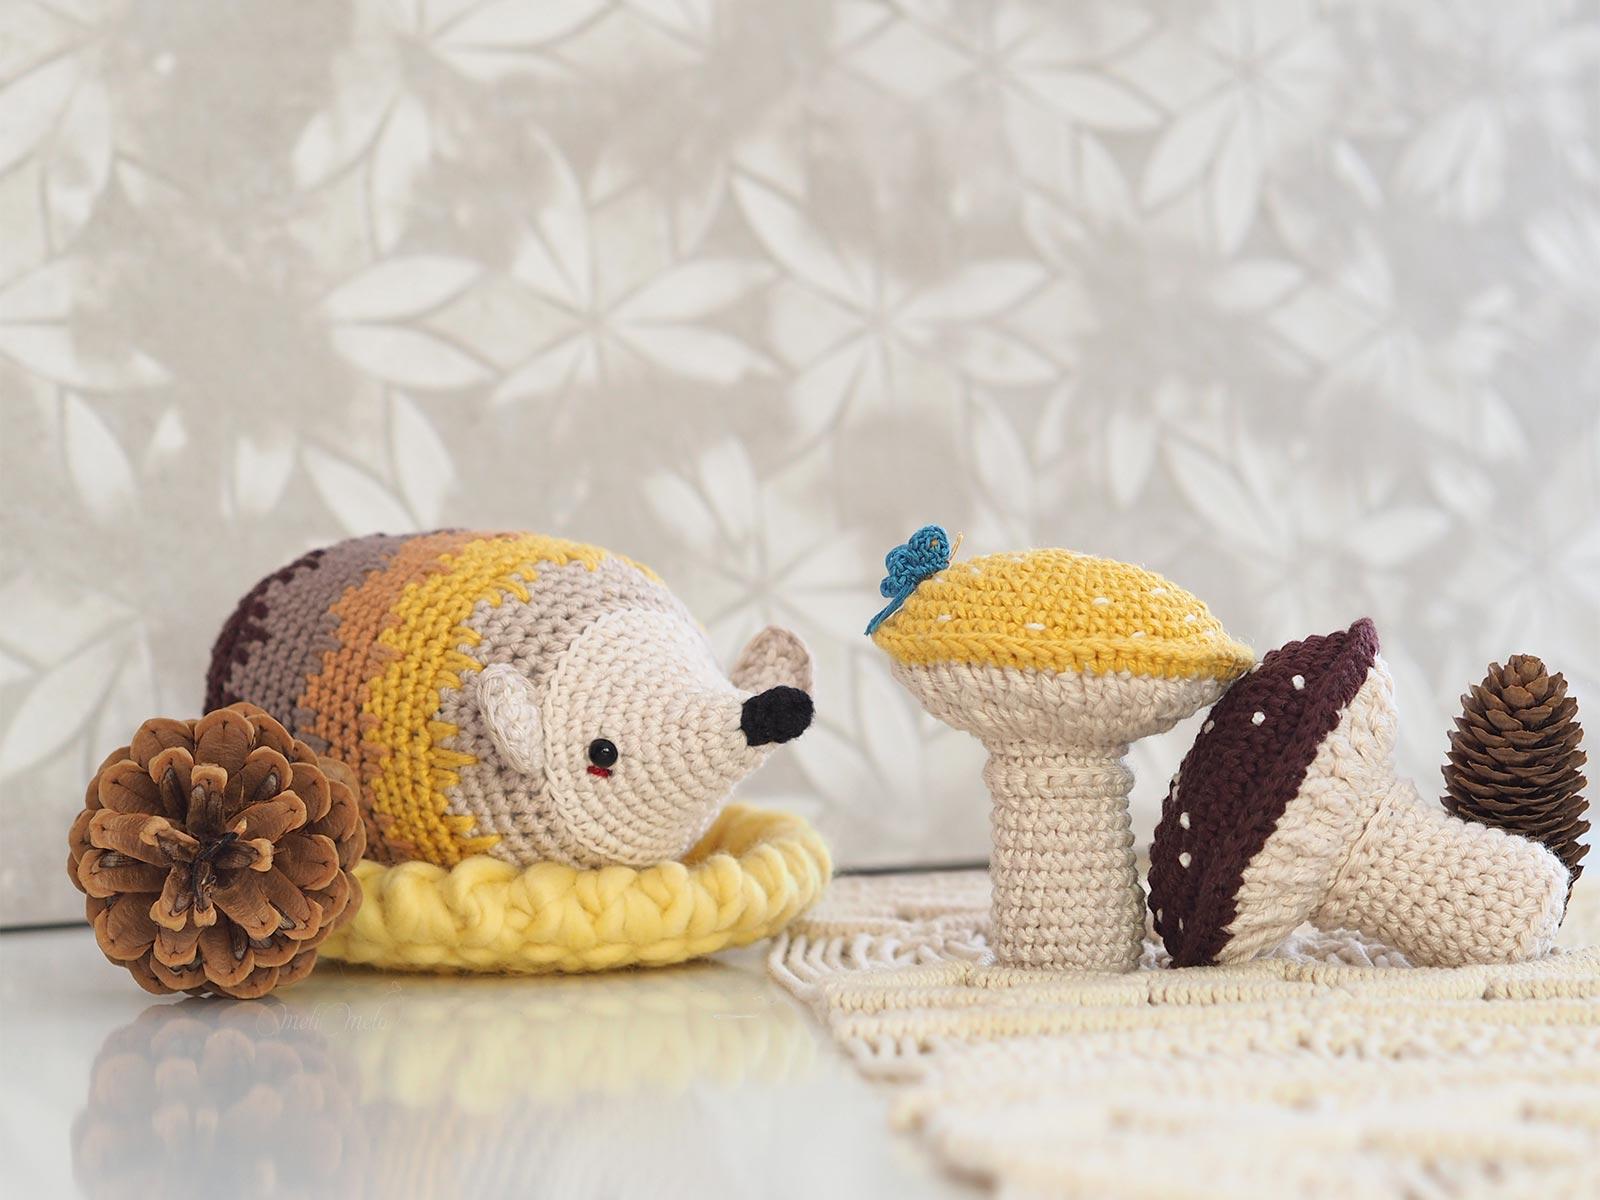 automne-amigurumi-papillon-herisson-champignon-hedgehog-mushroom-ricorumi-fall-crochet-laboutiquedemelimelo